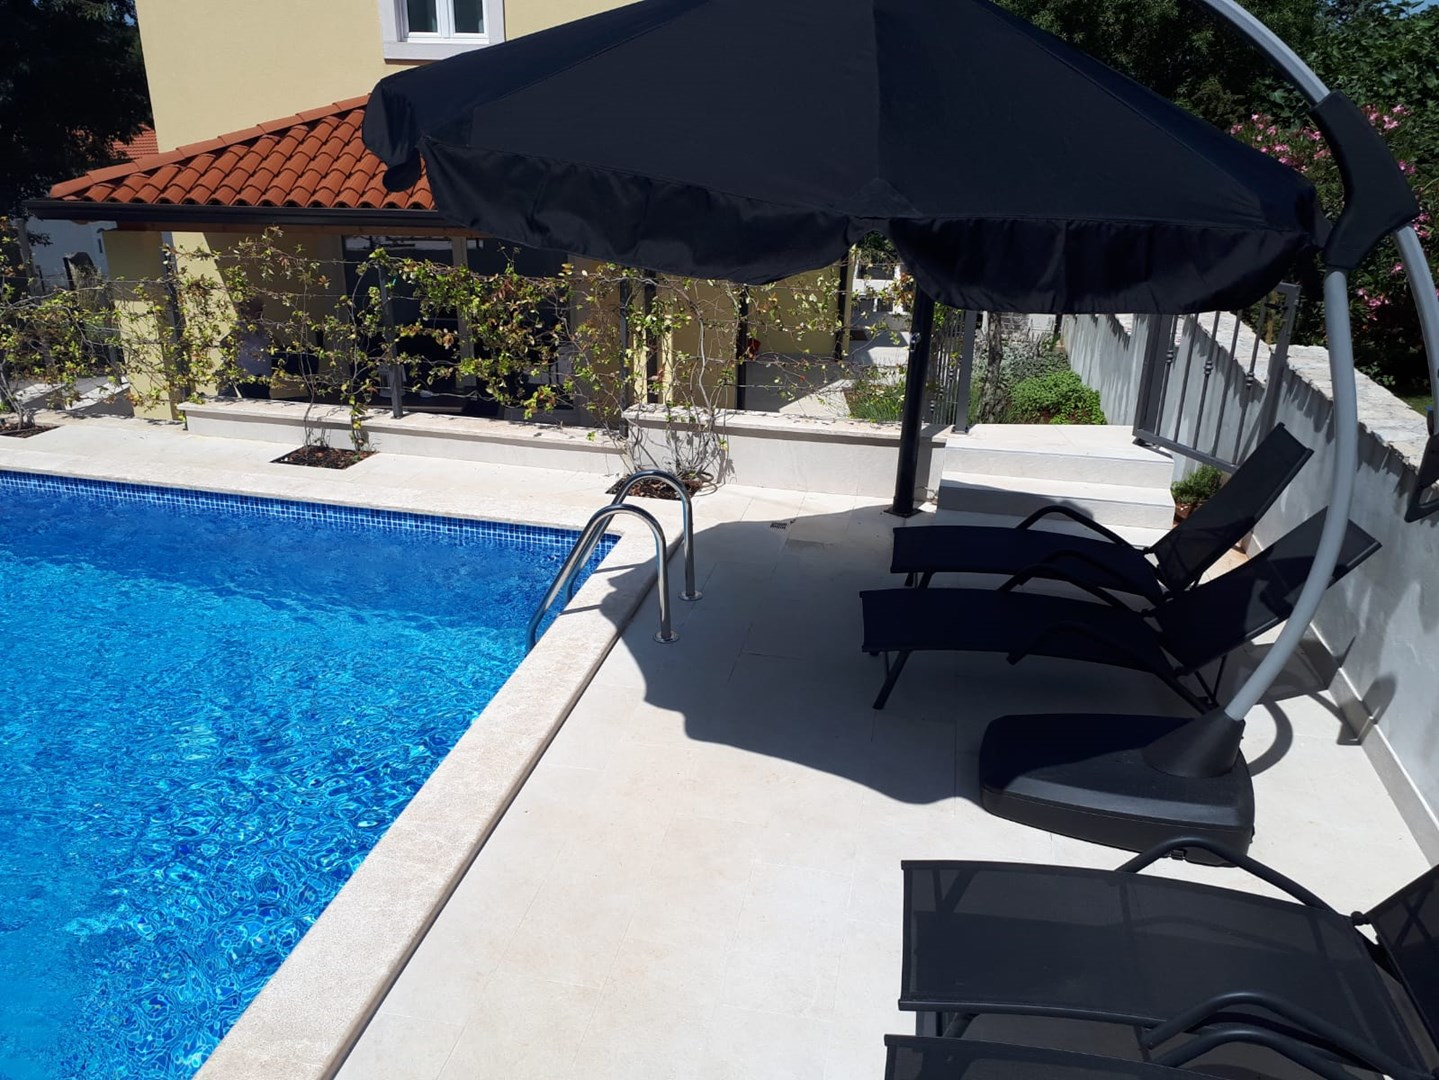 Ferienhaus Villa Albina mit privatem Pool in der Nähe von Aquacolors (2240246), Mugeba, , Istrien, Kroatien, Bild 4